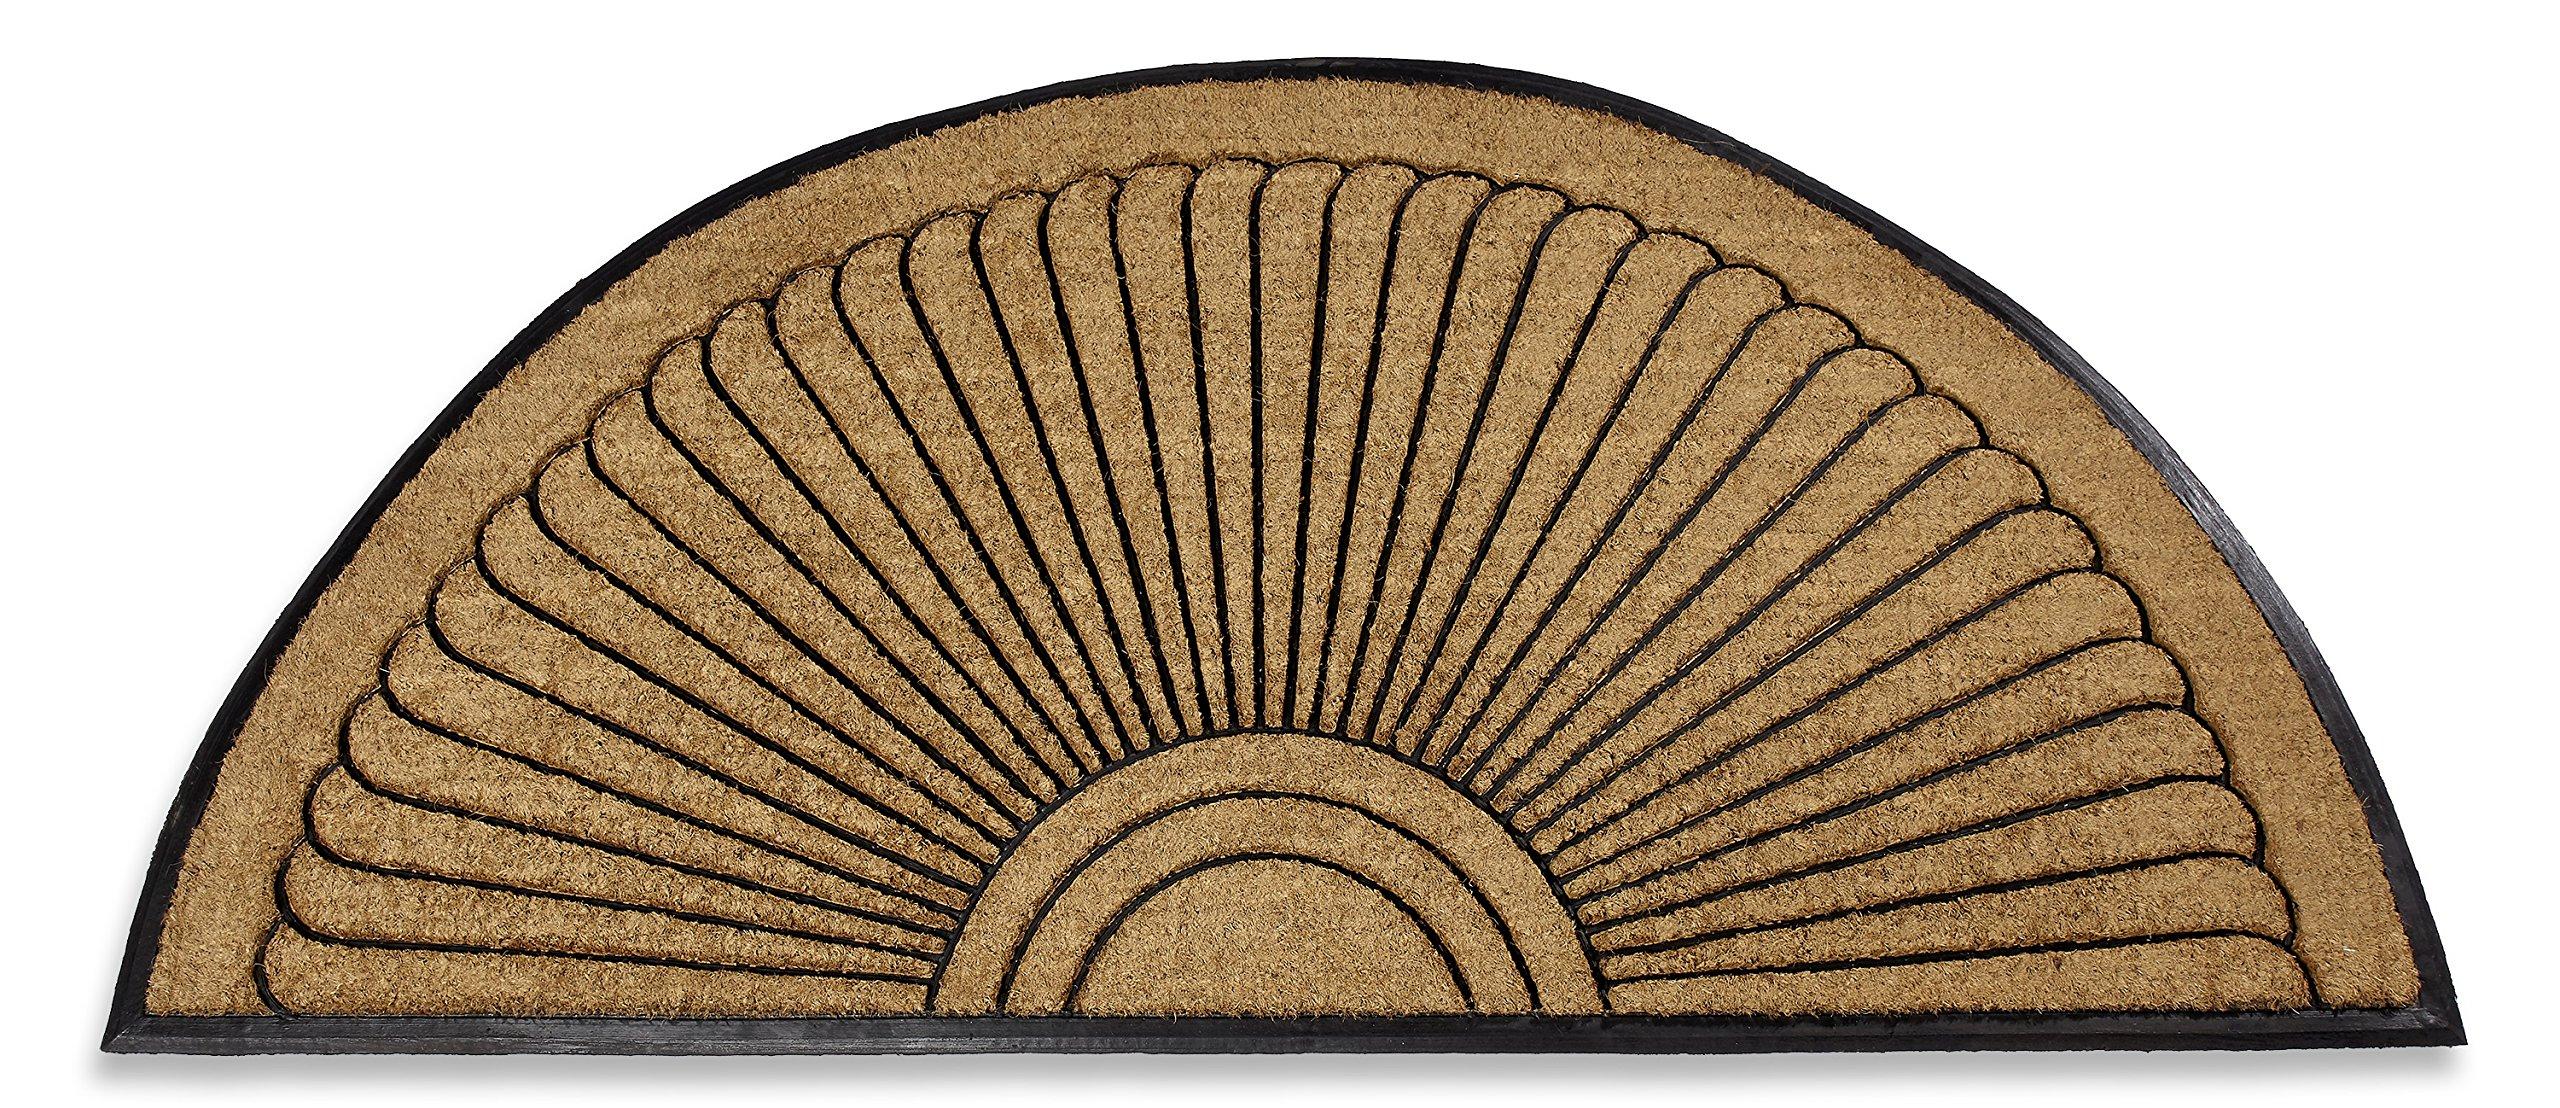 Kempf Coco Fiber Half Round in-Laid Doormat (30'' X 48'')